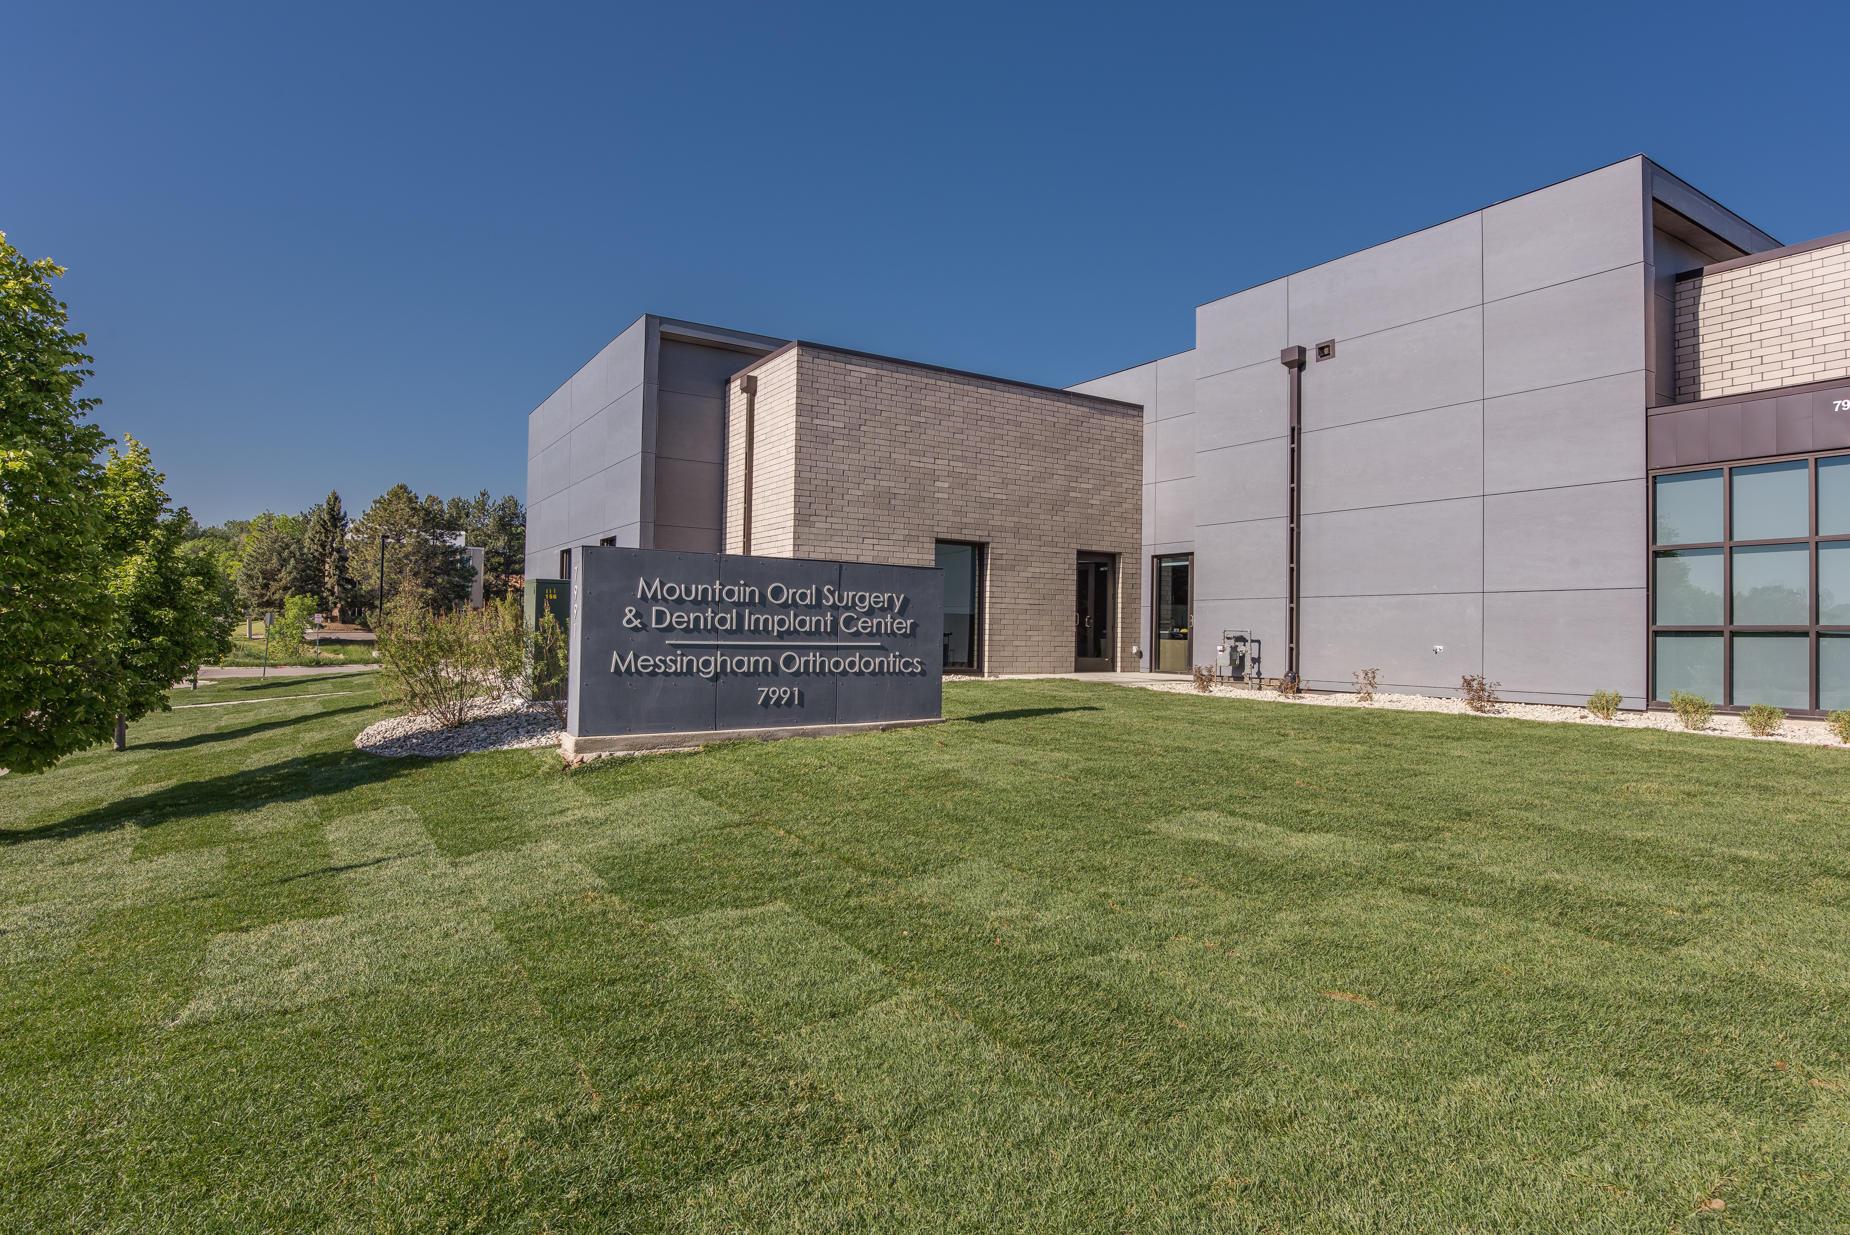 Mountain Oral Surgery & Dental Implant Center